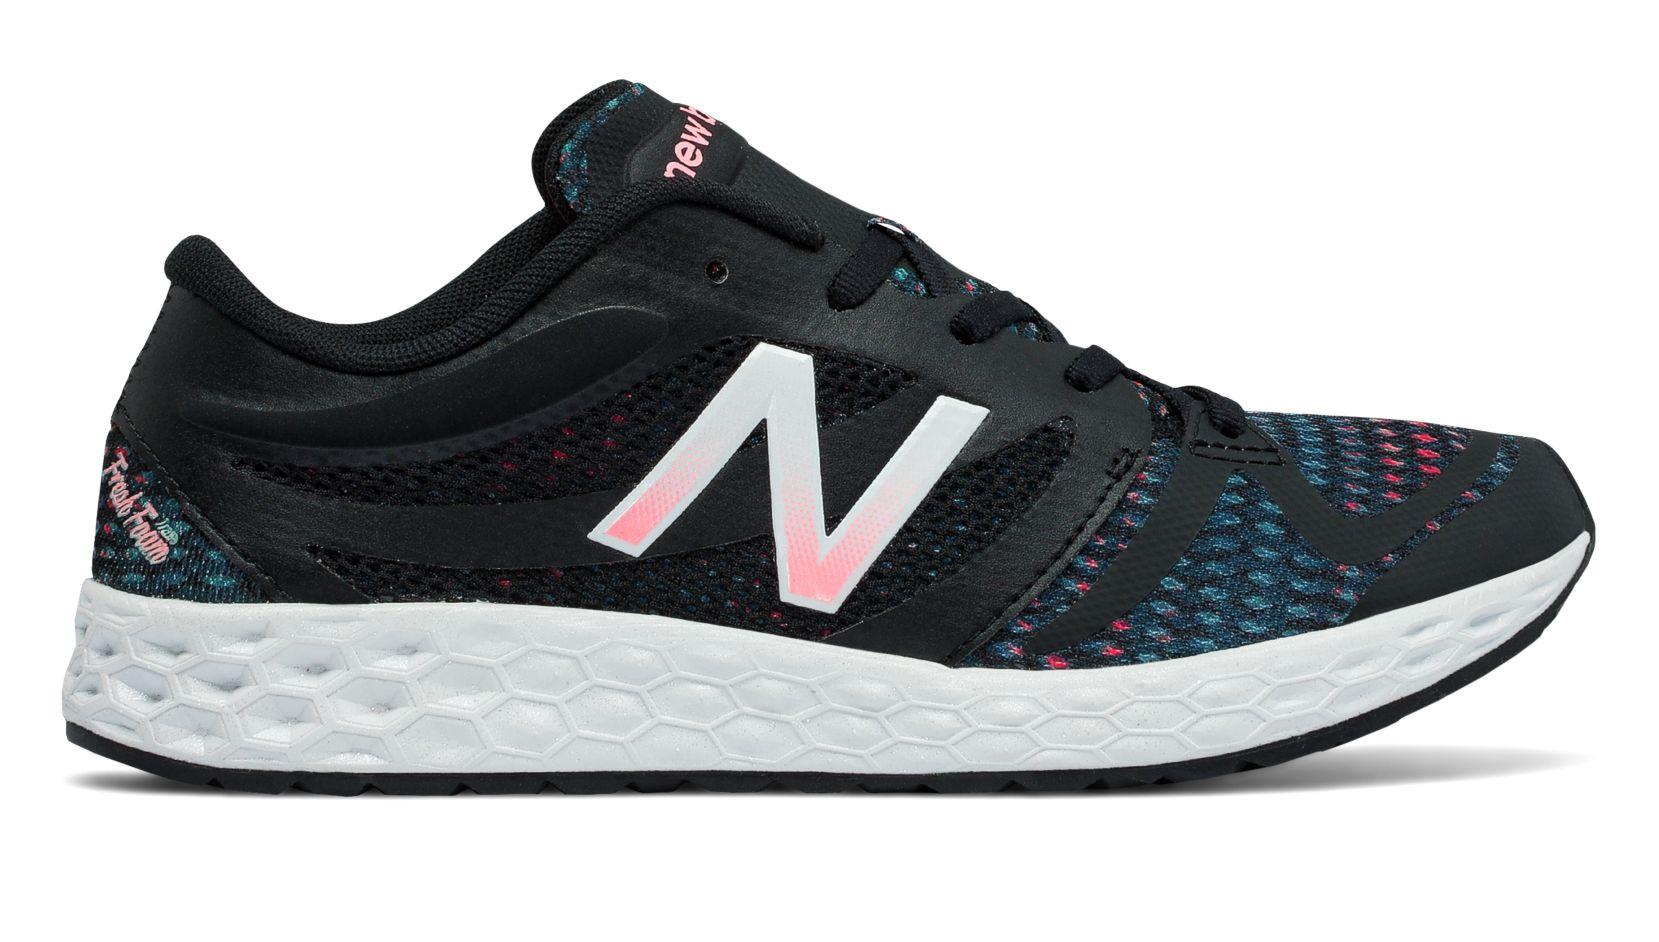 NB Fresh Foam 822v3 Graphic Trainer, Black with Typhoon & Alpha Pink